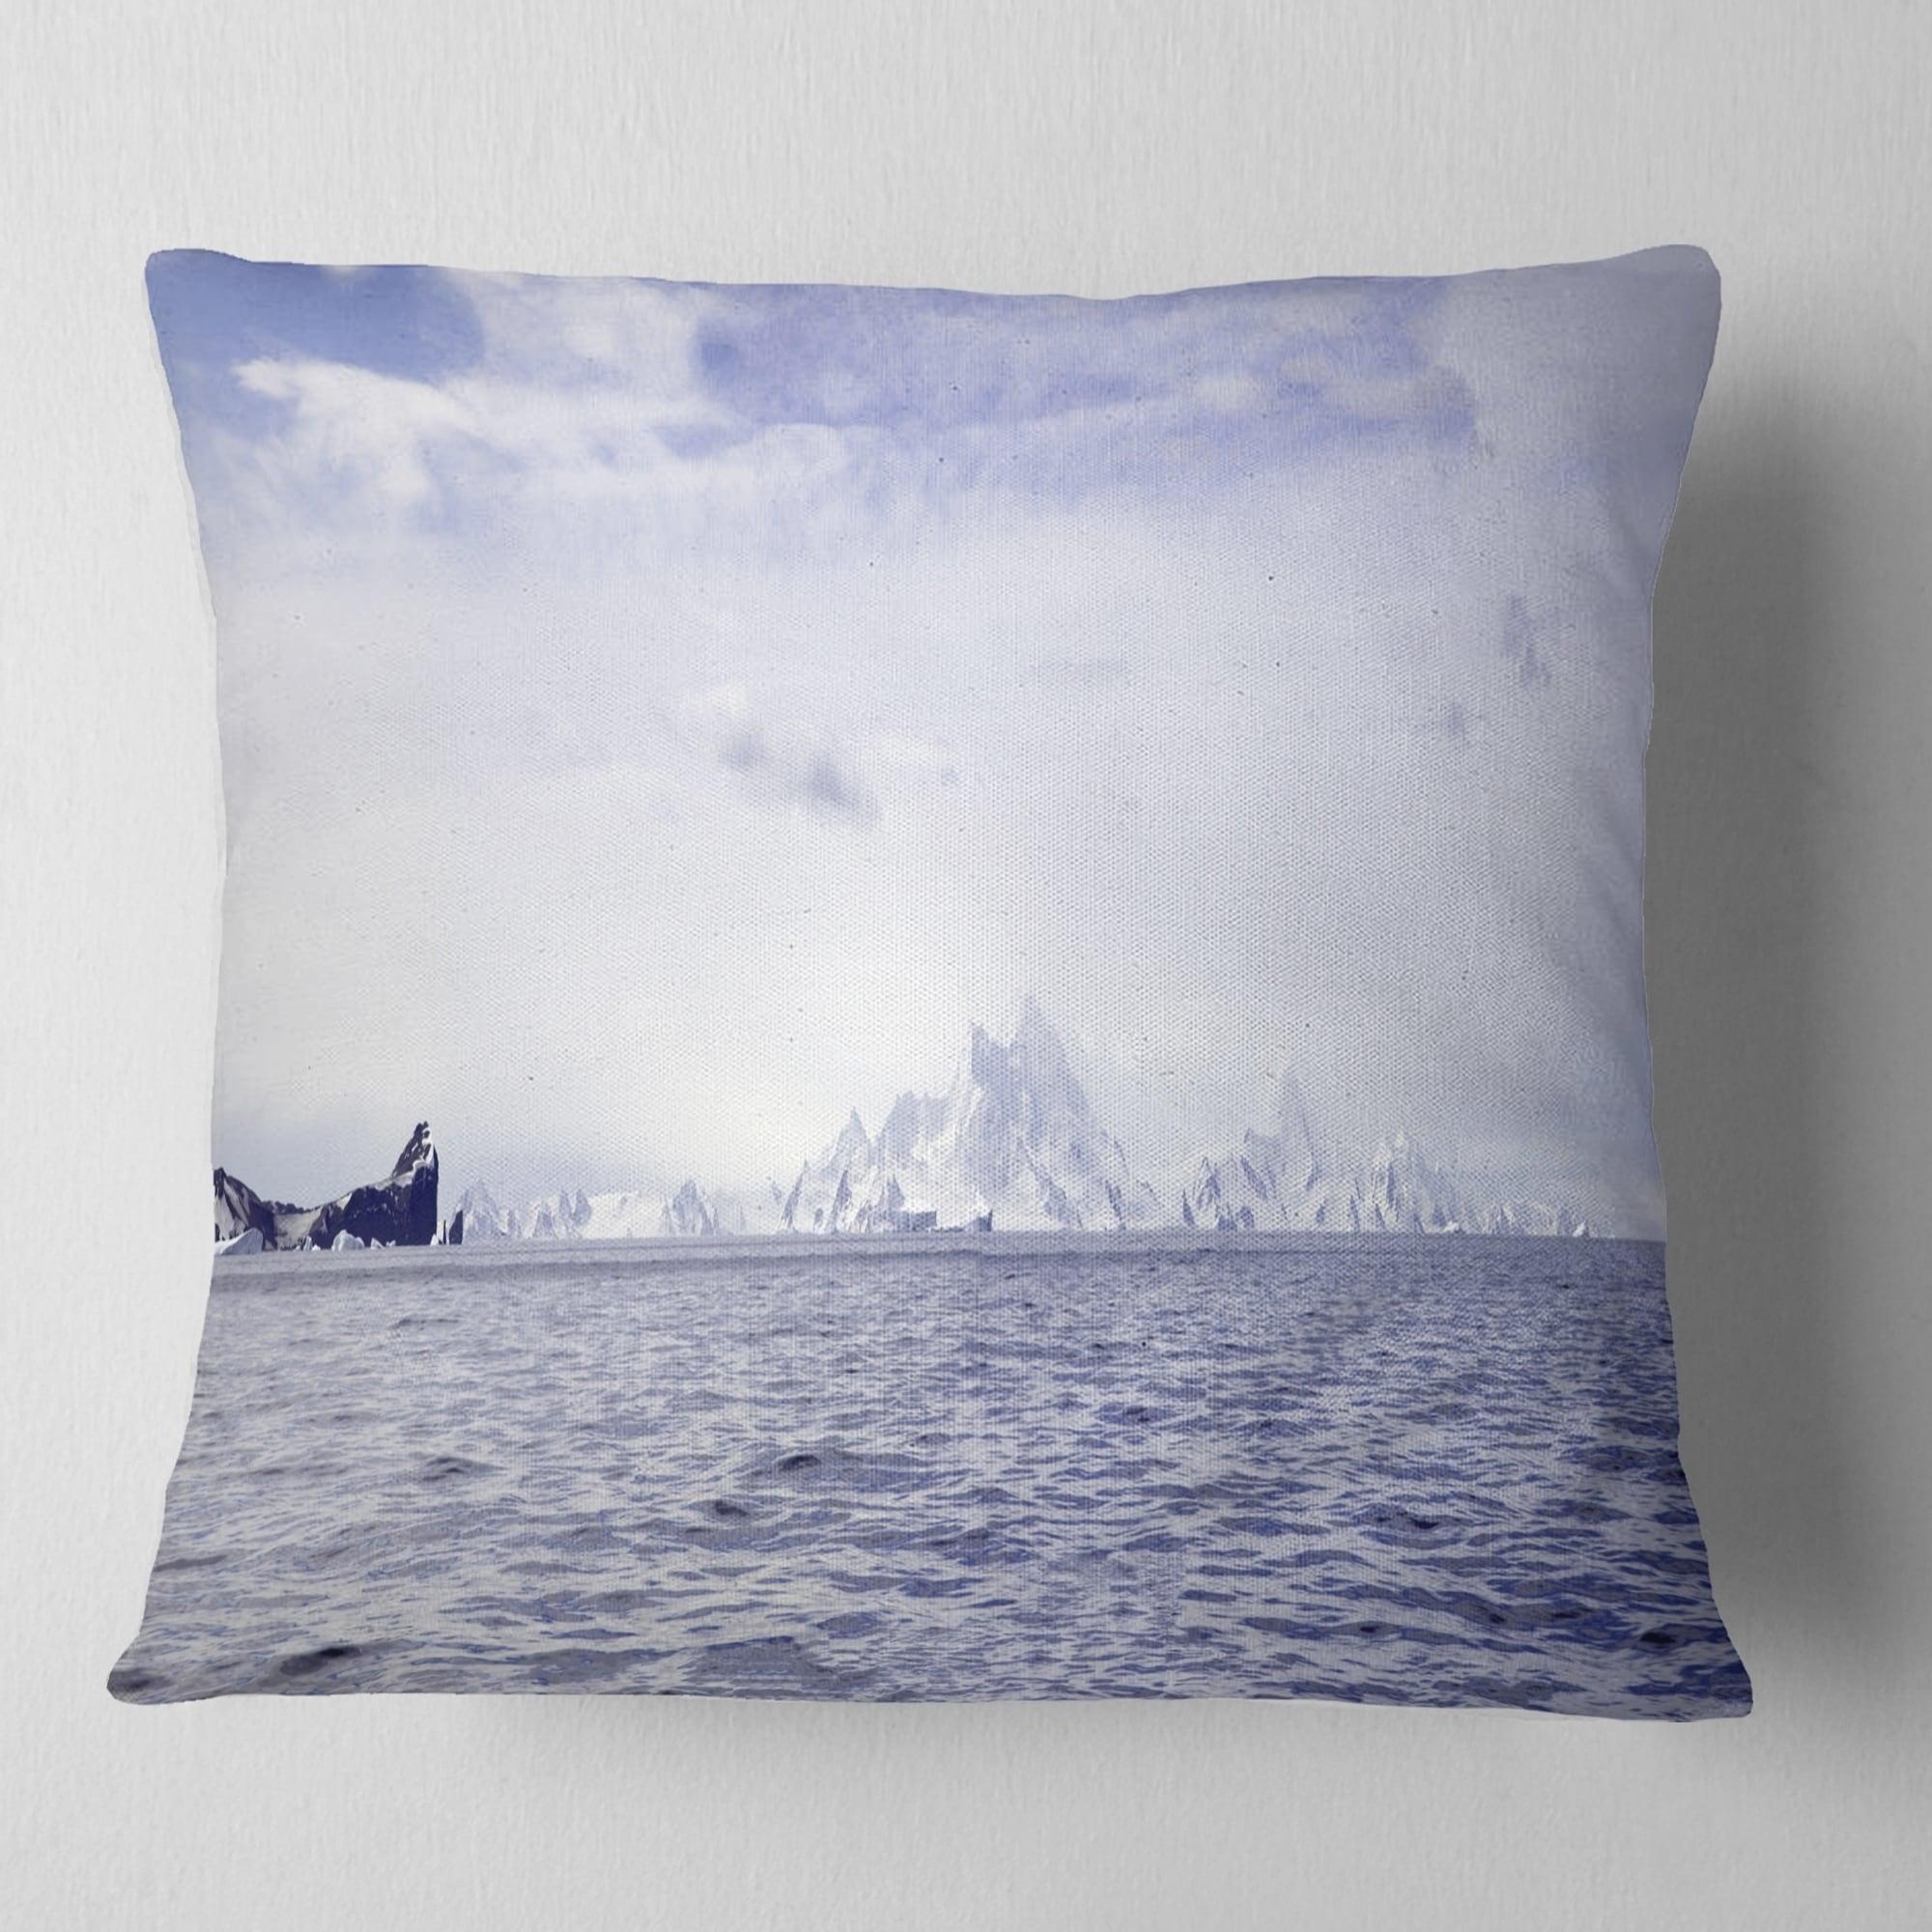 Design Art Designart Antarctic Sea With Icebergs Seascape Throw Pillow Walmart Com Walmart Com